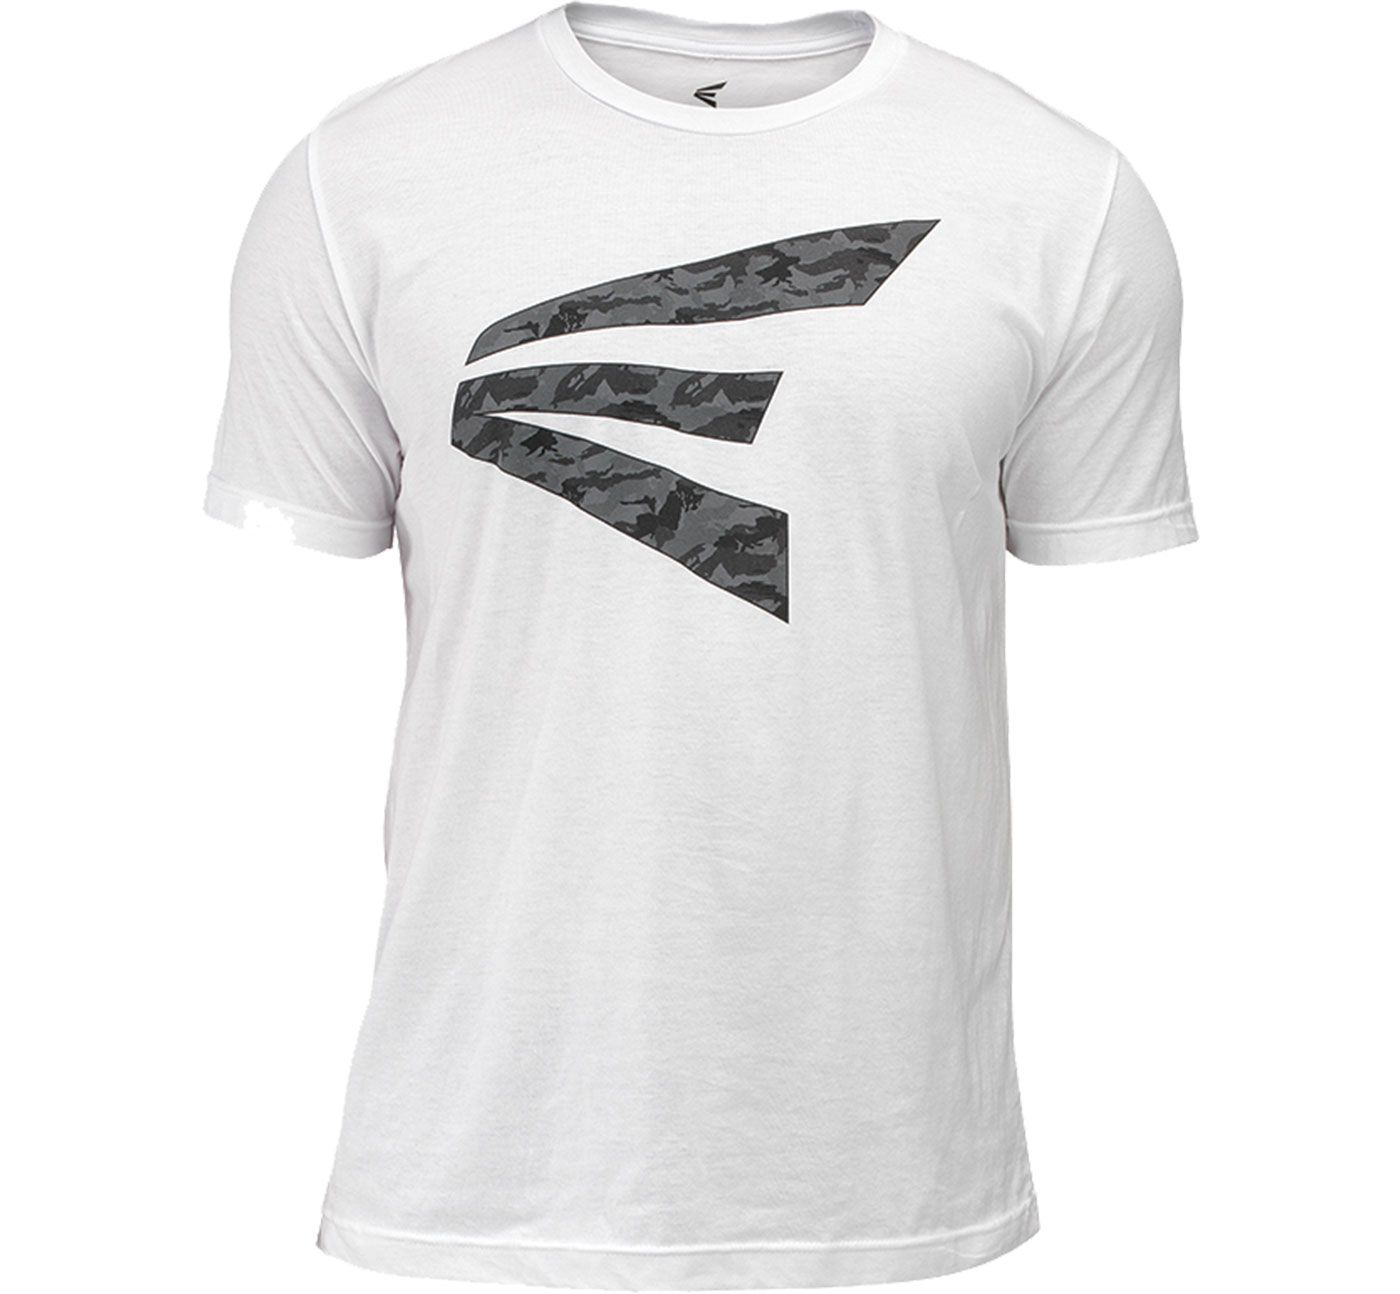 Easton Men's Screamin' E Basecamo T-Shirt